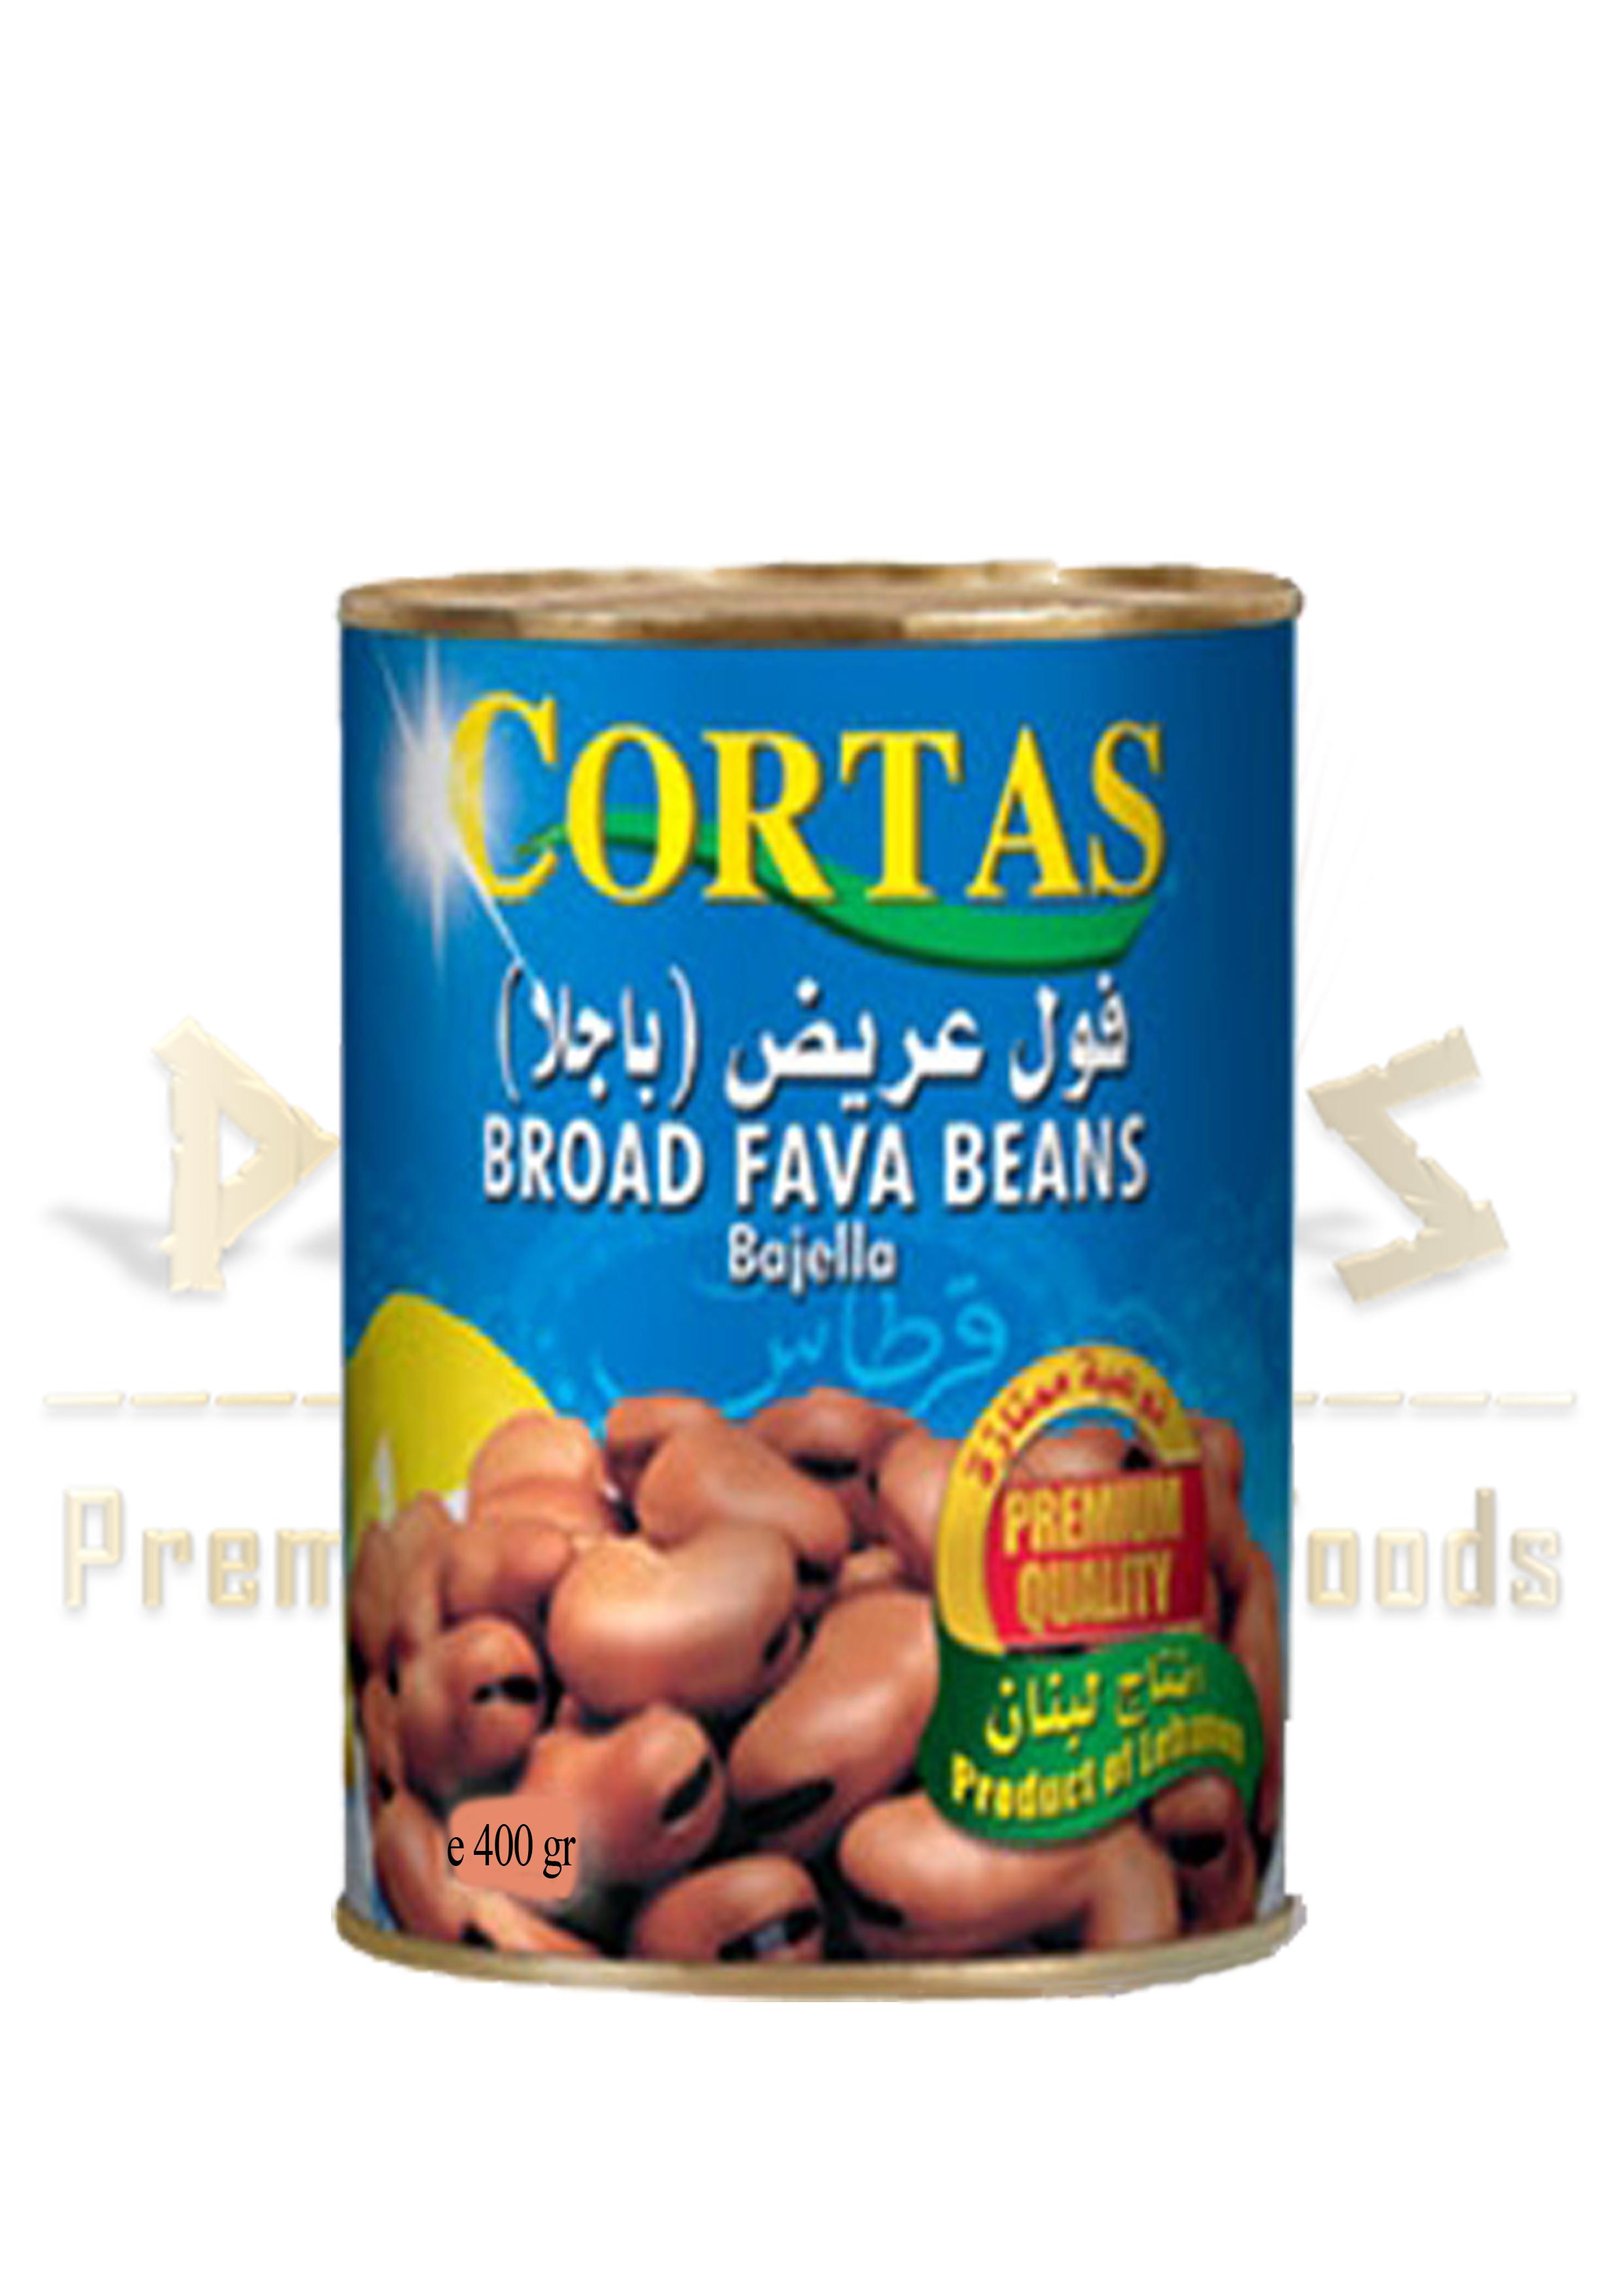 broad fava beans